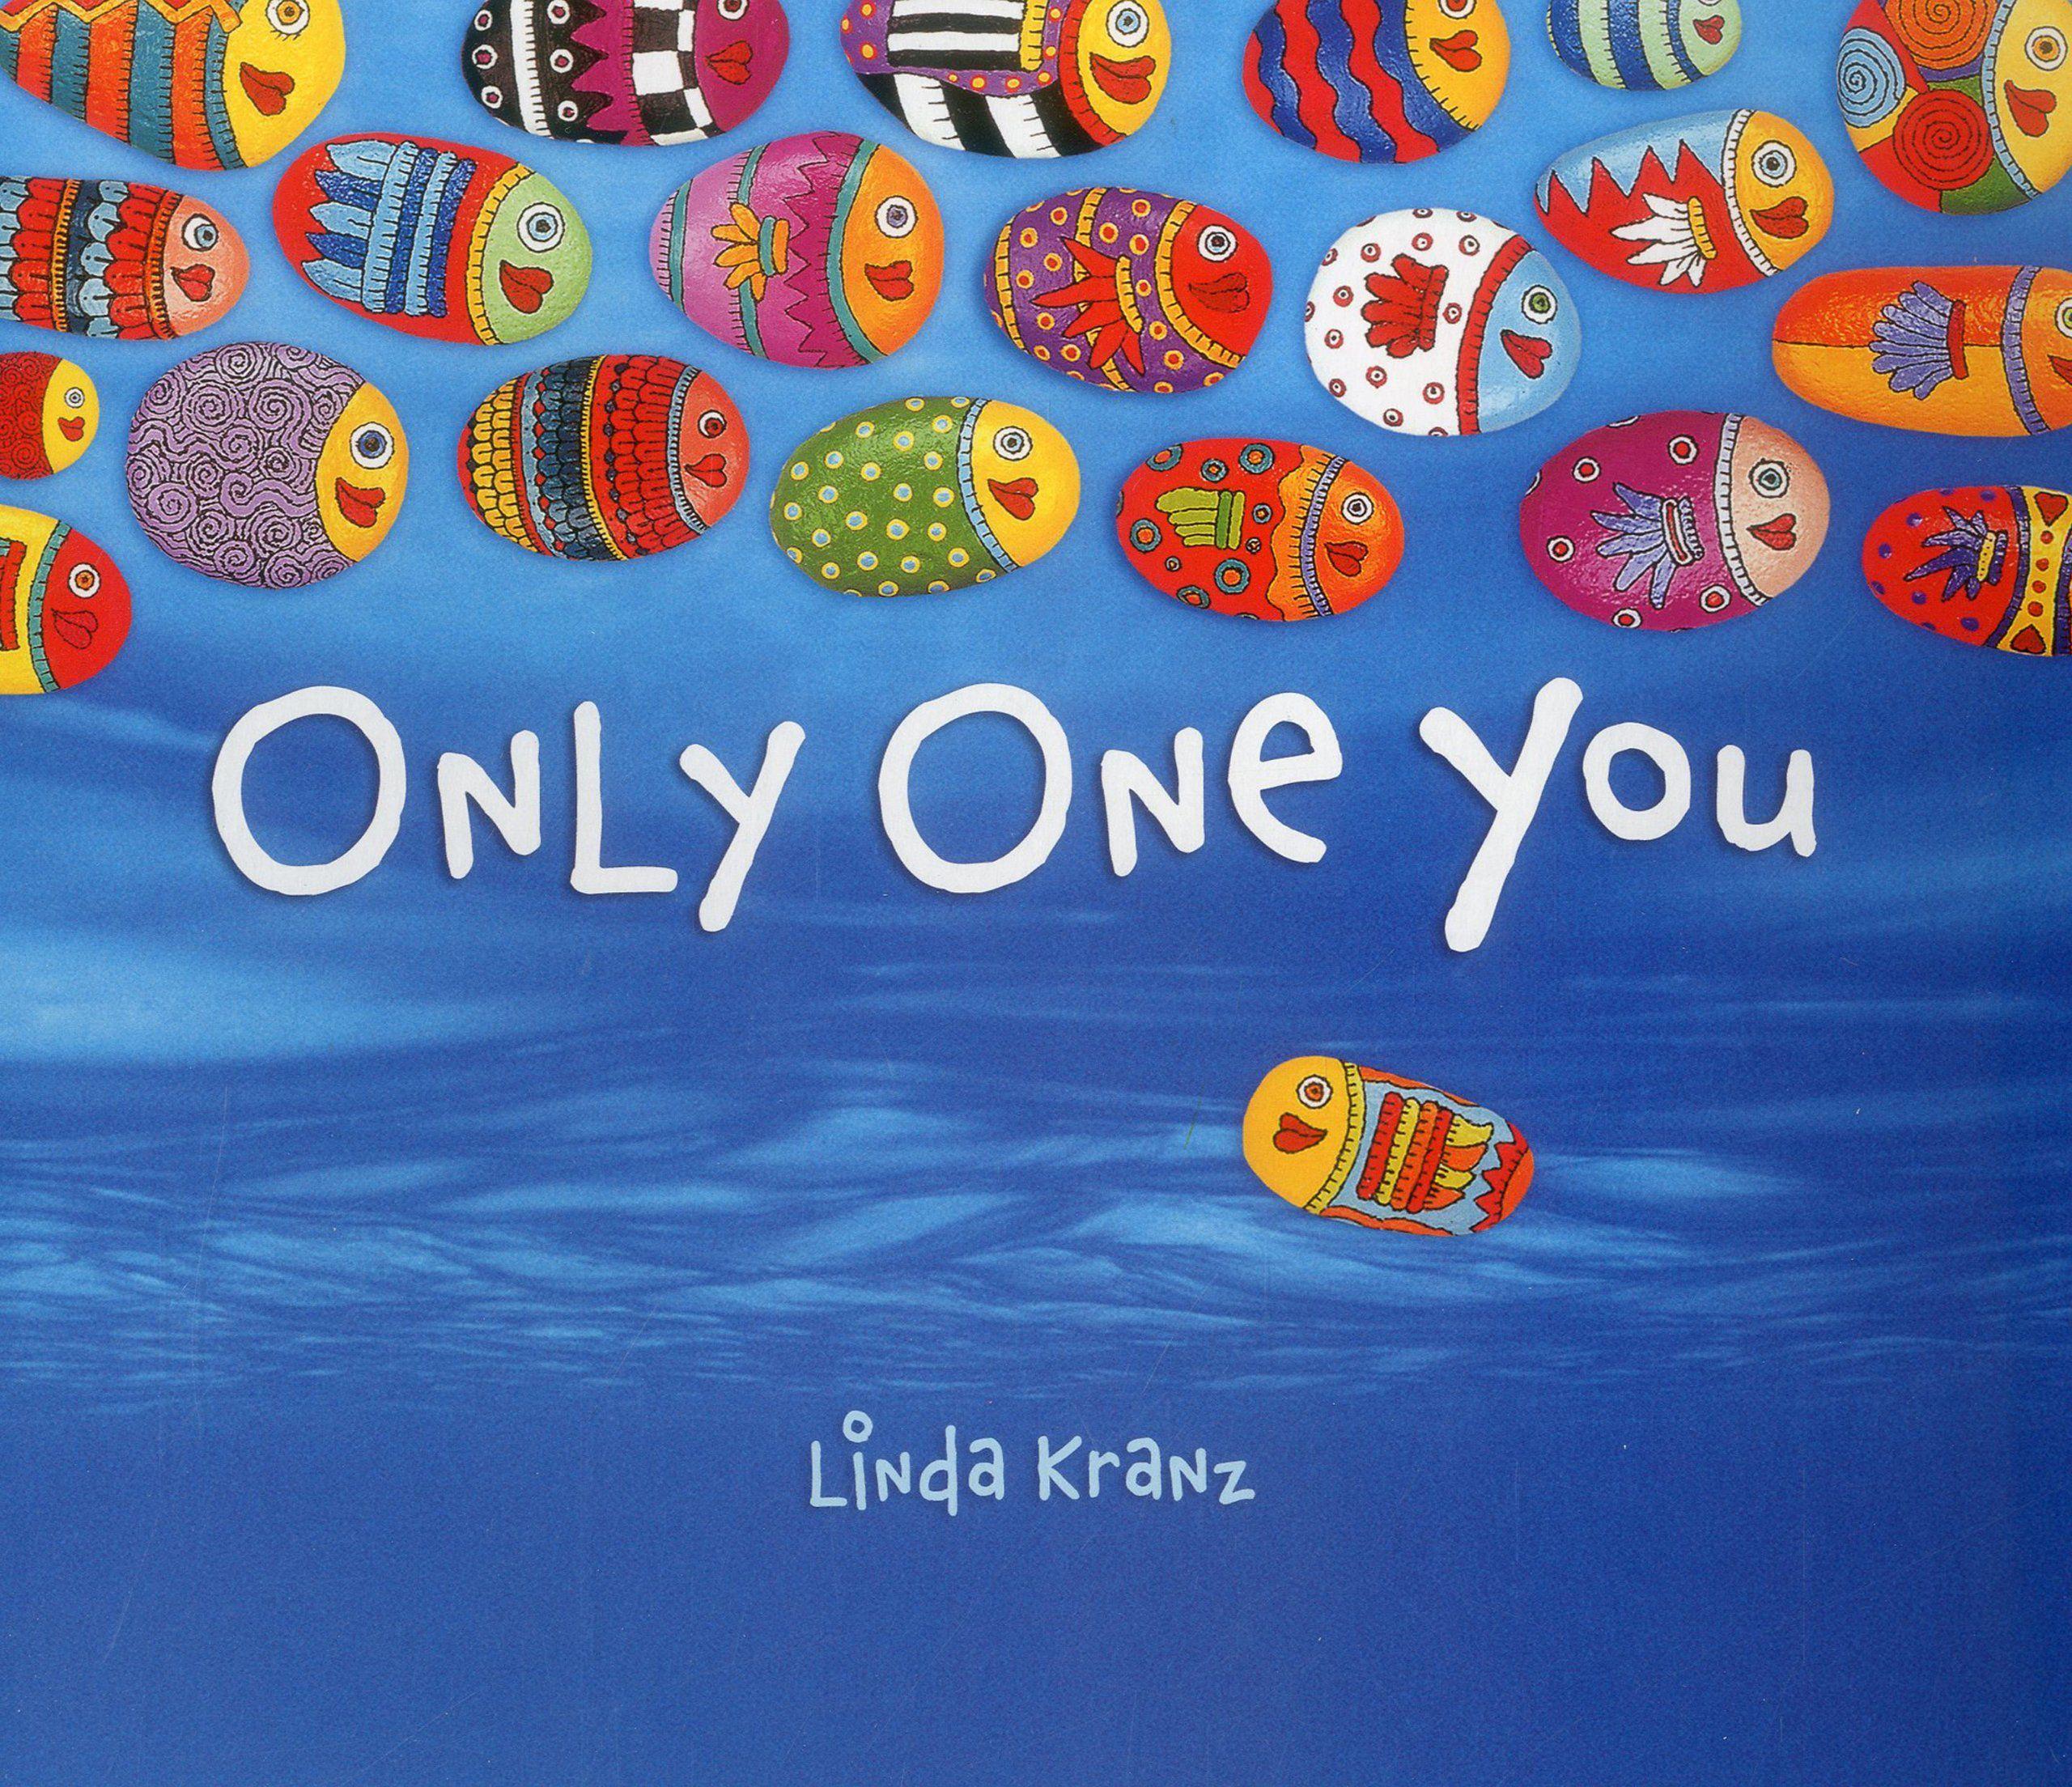 Portada del libro Only One You de Linda Kranz